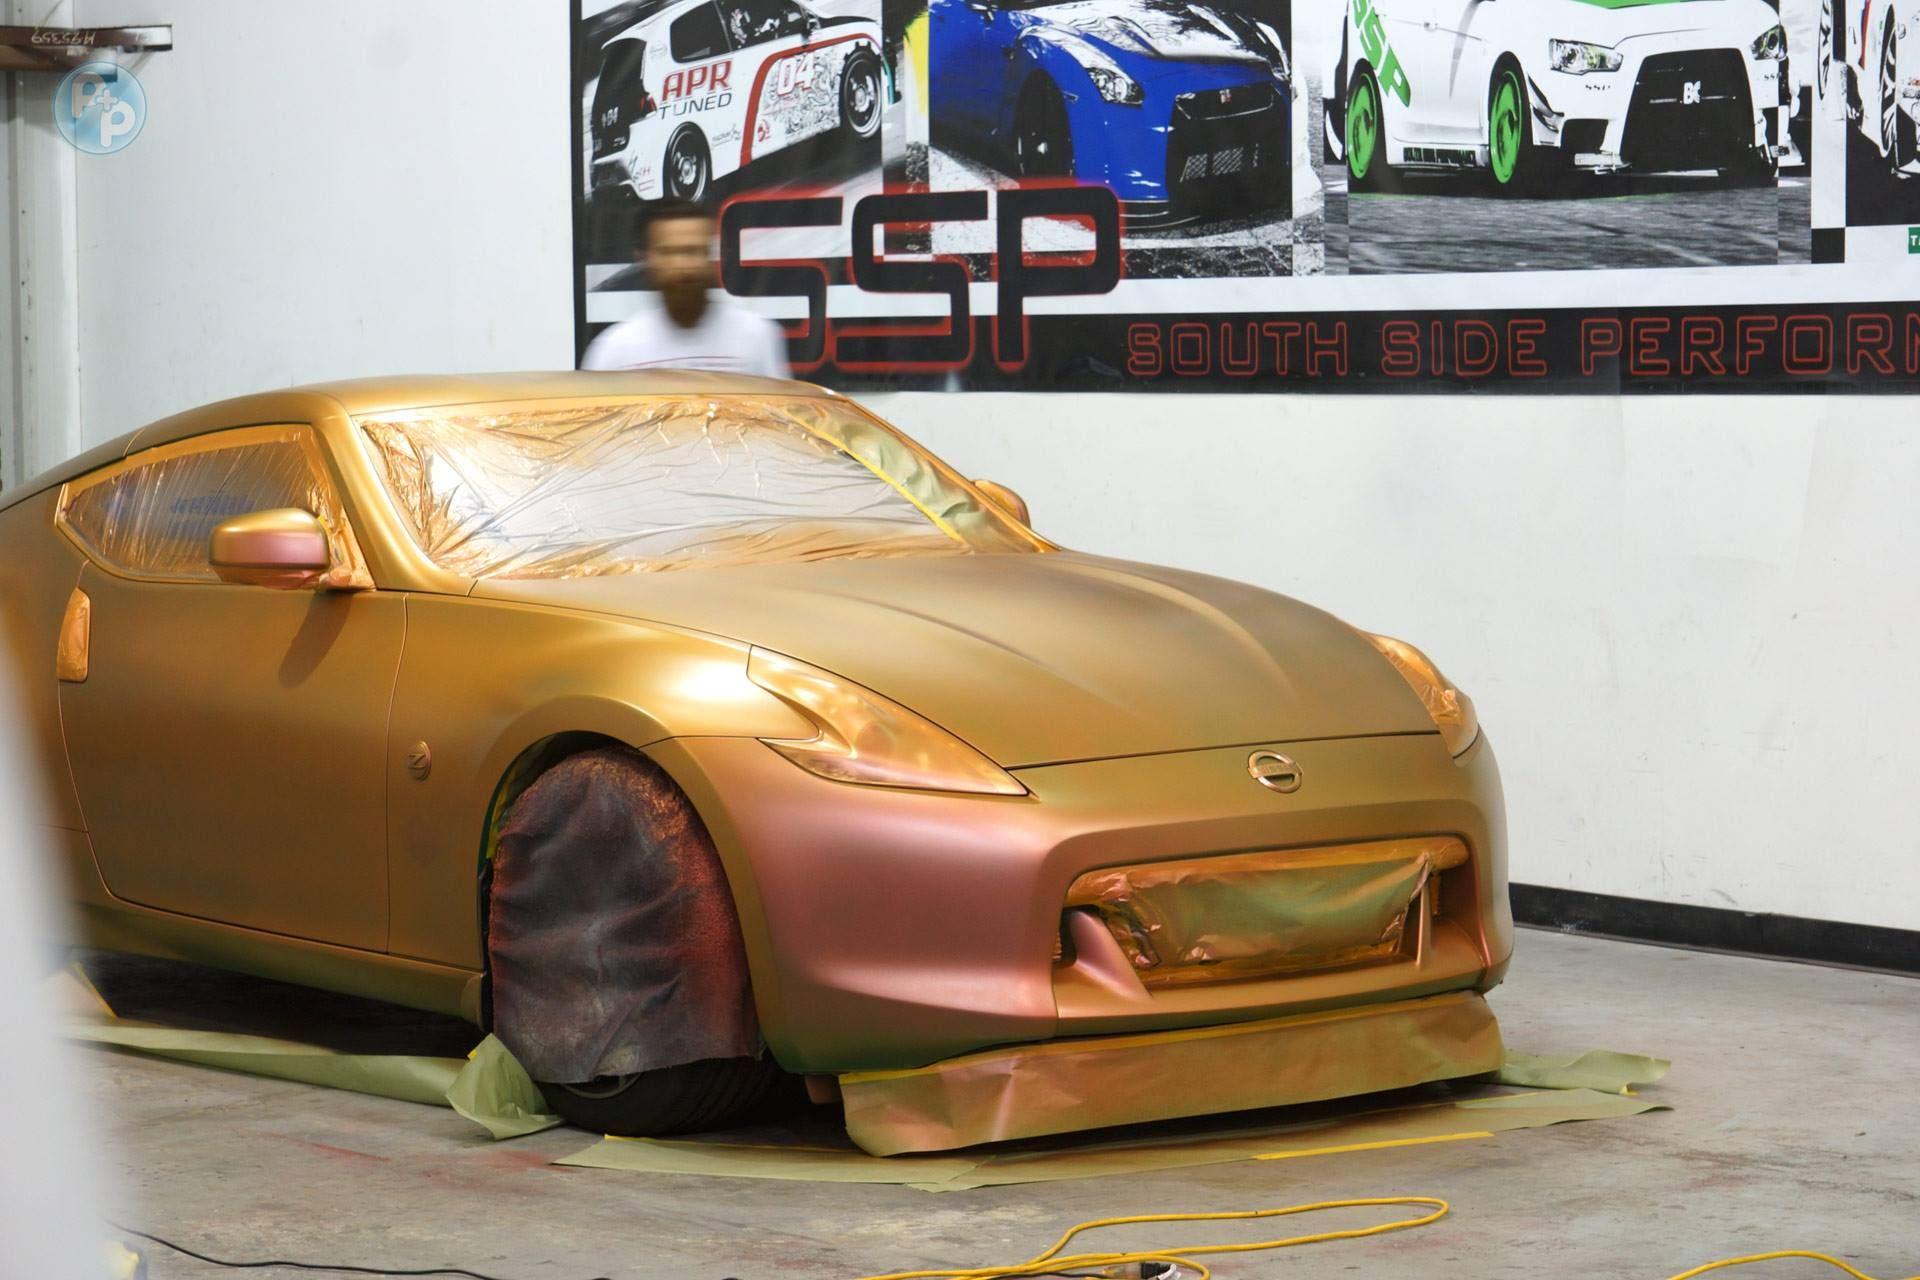 Phoenix Chameleon over a hunter green base coat Car wrap